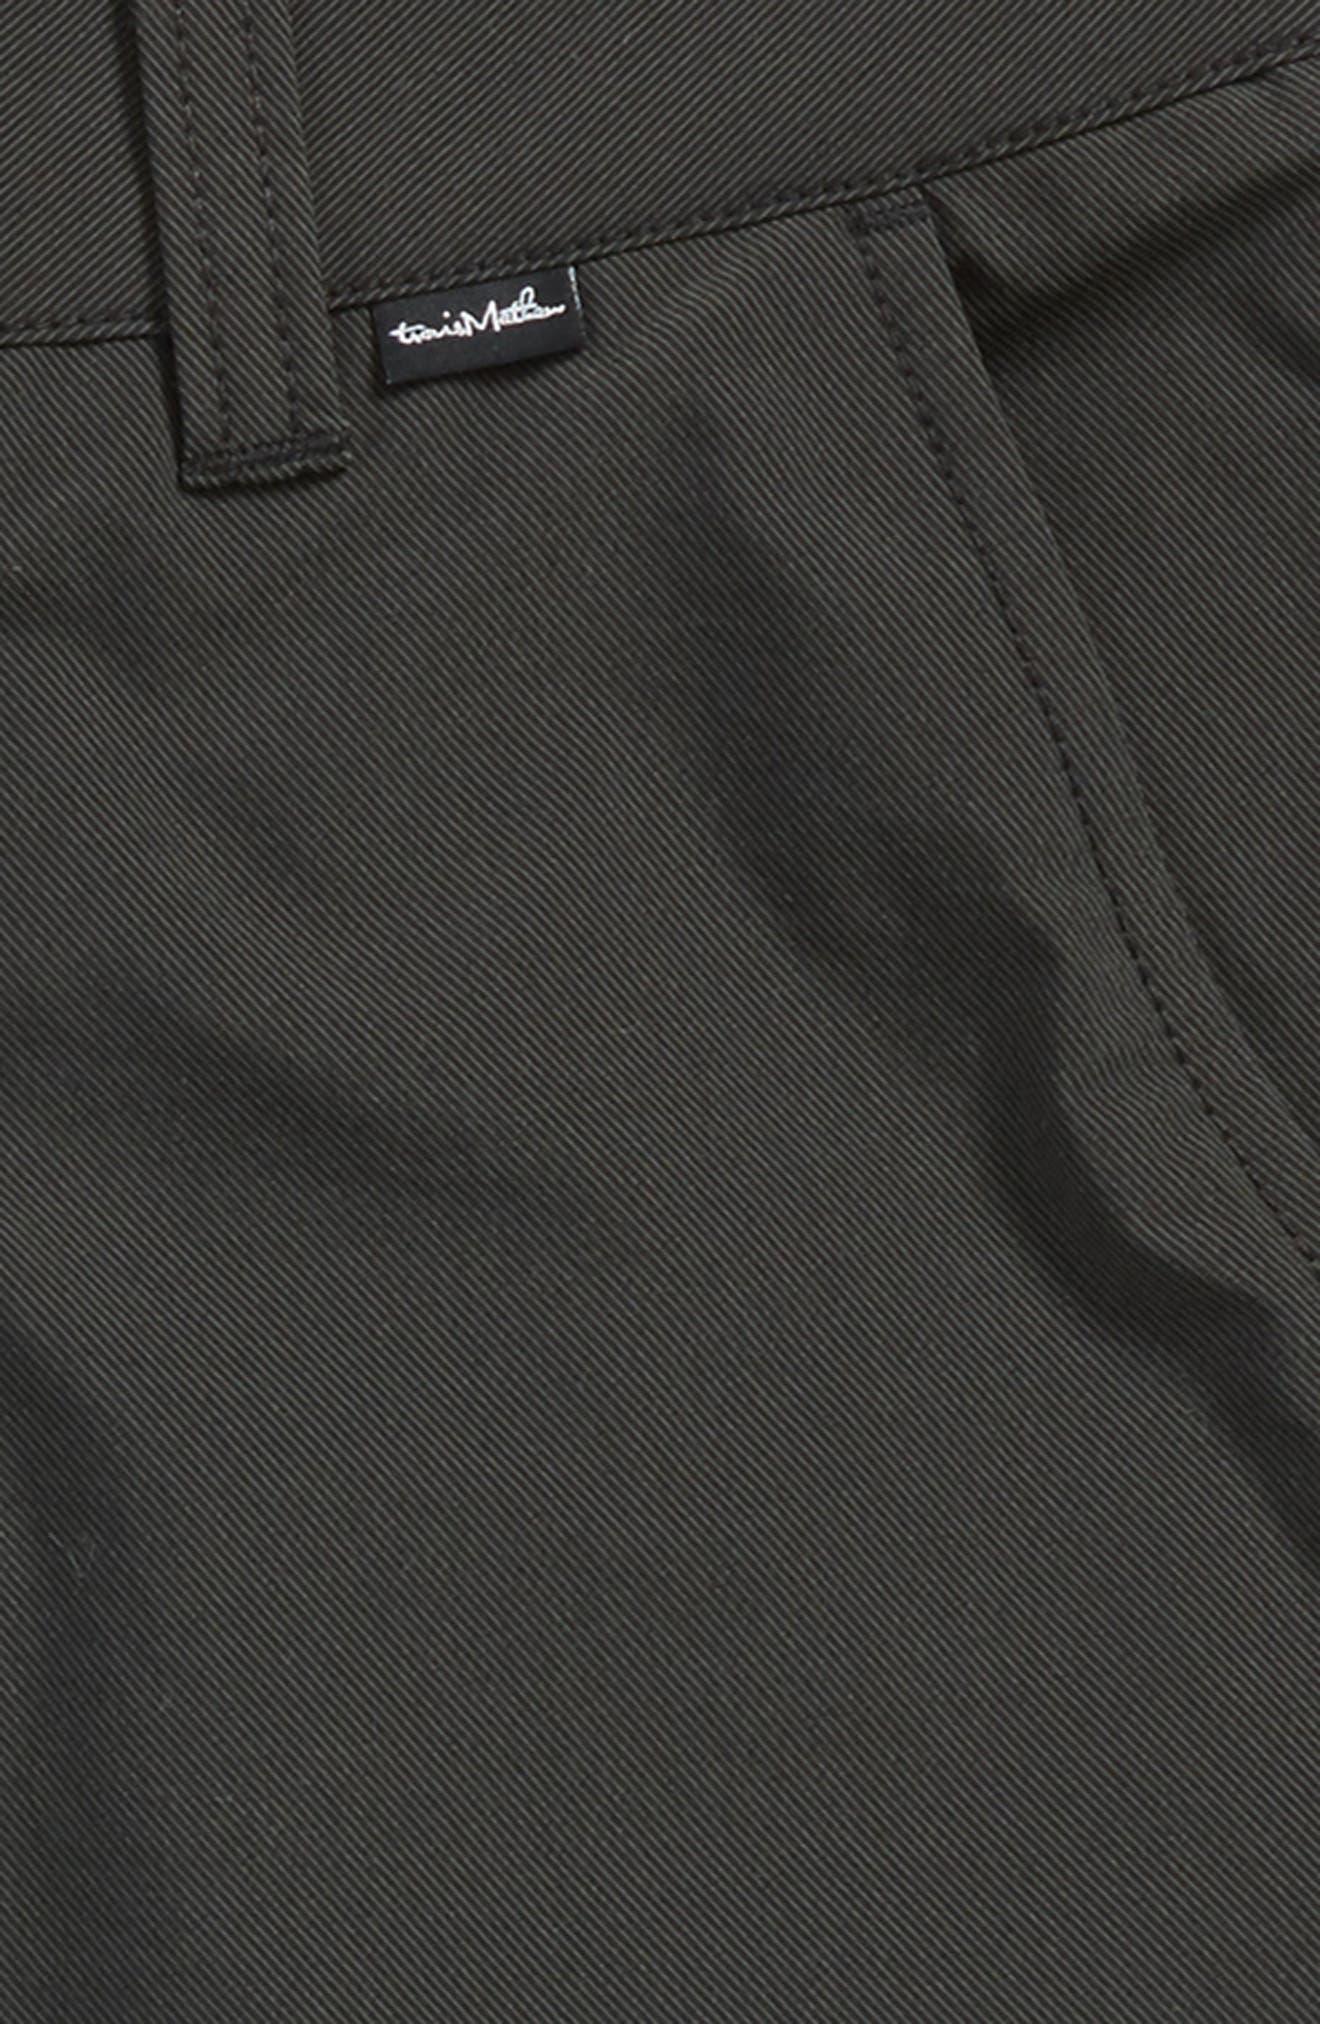 Hef Flex Shorts,                             Alternate thumbnail 2, color,                             Black